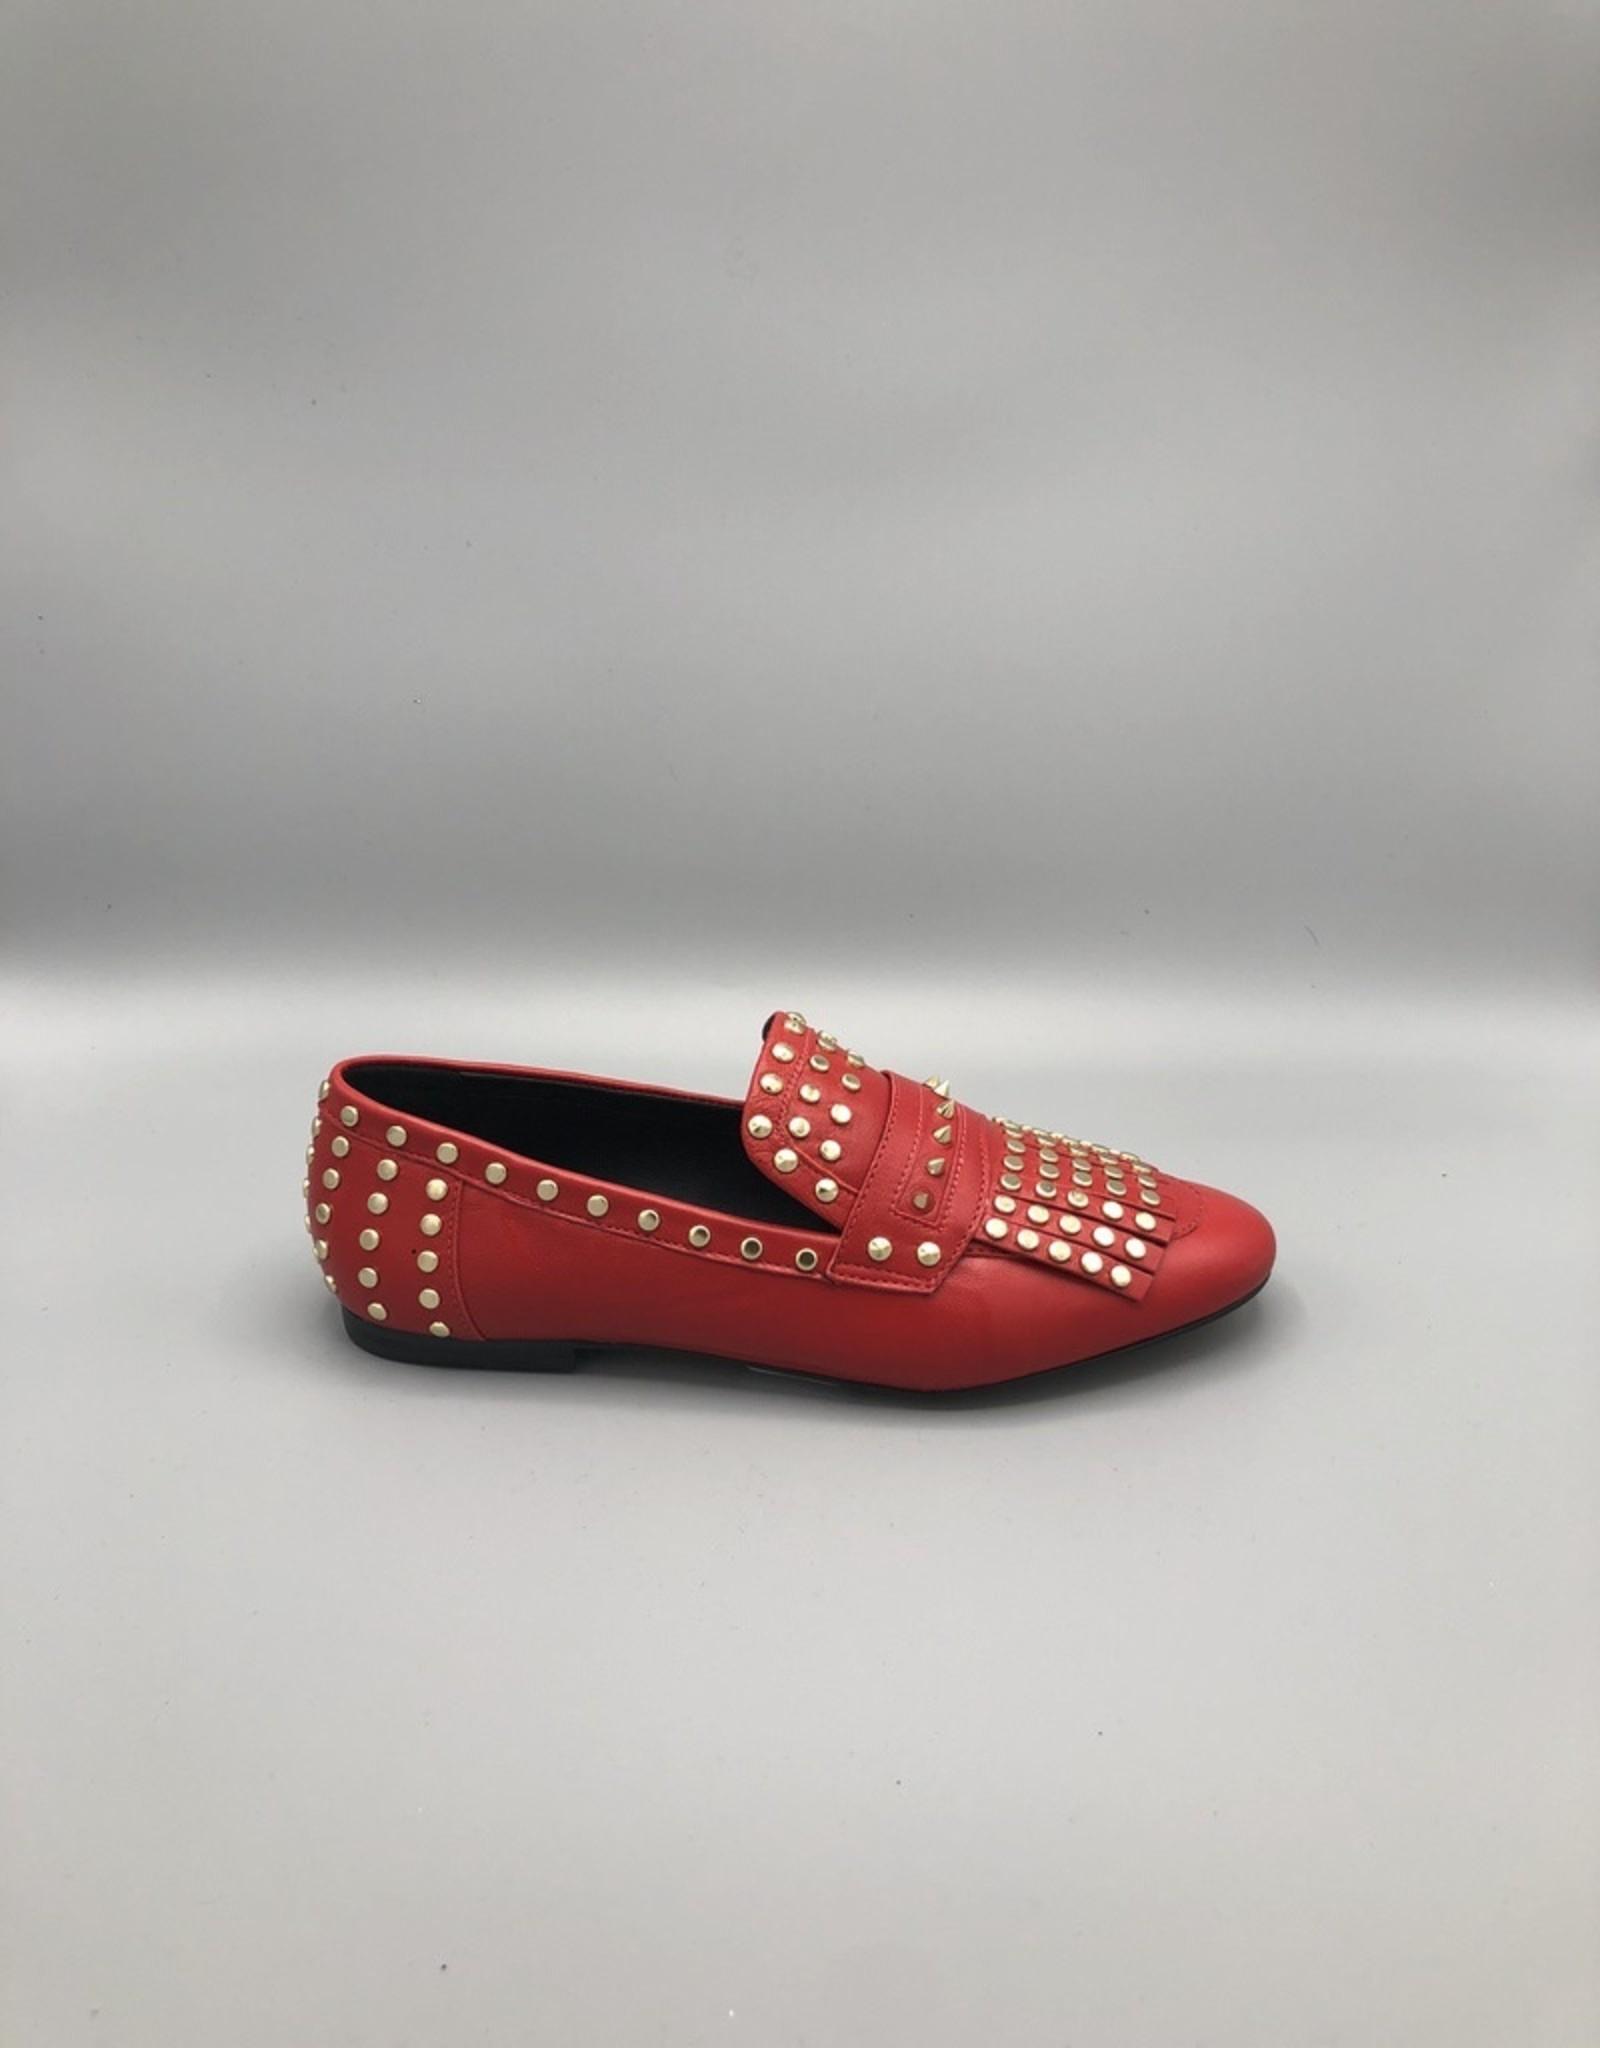 Carrano Bruno Menegatti Fringed & Studded Leather Loafer